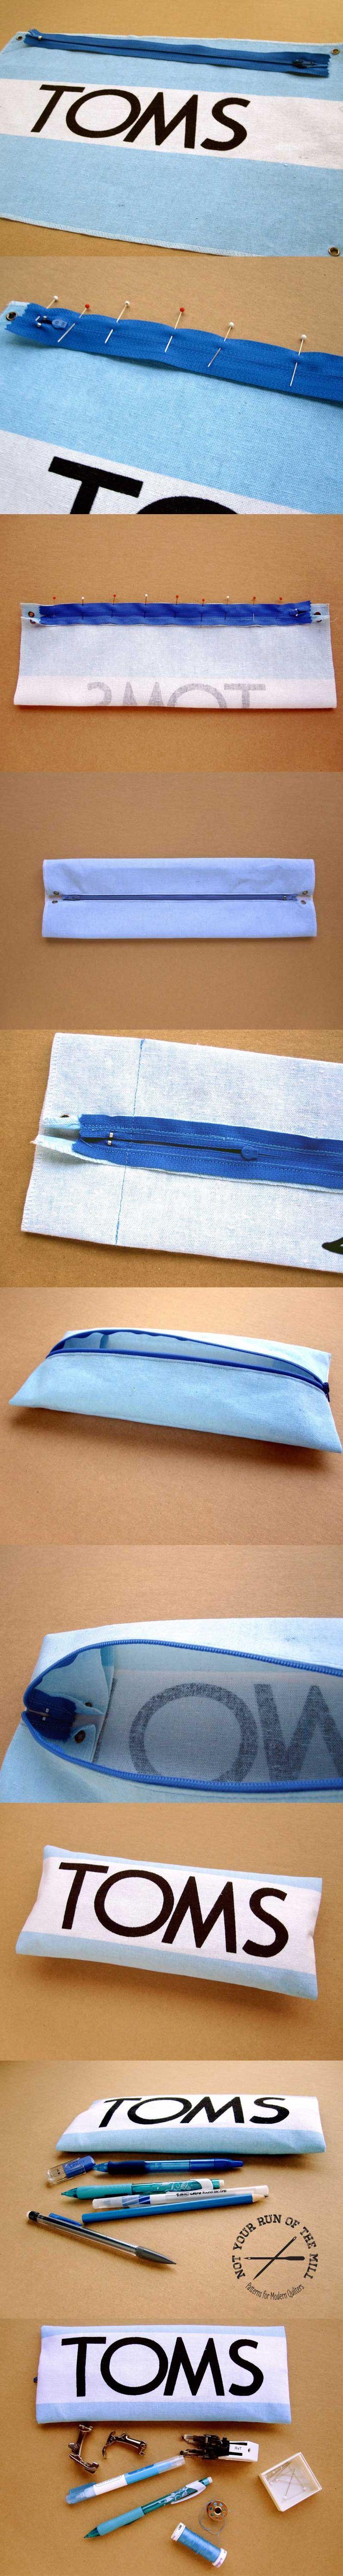 Tom's zipper pouch tutorial